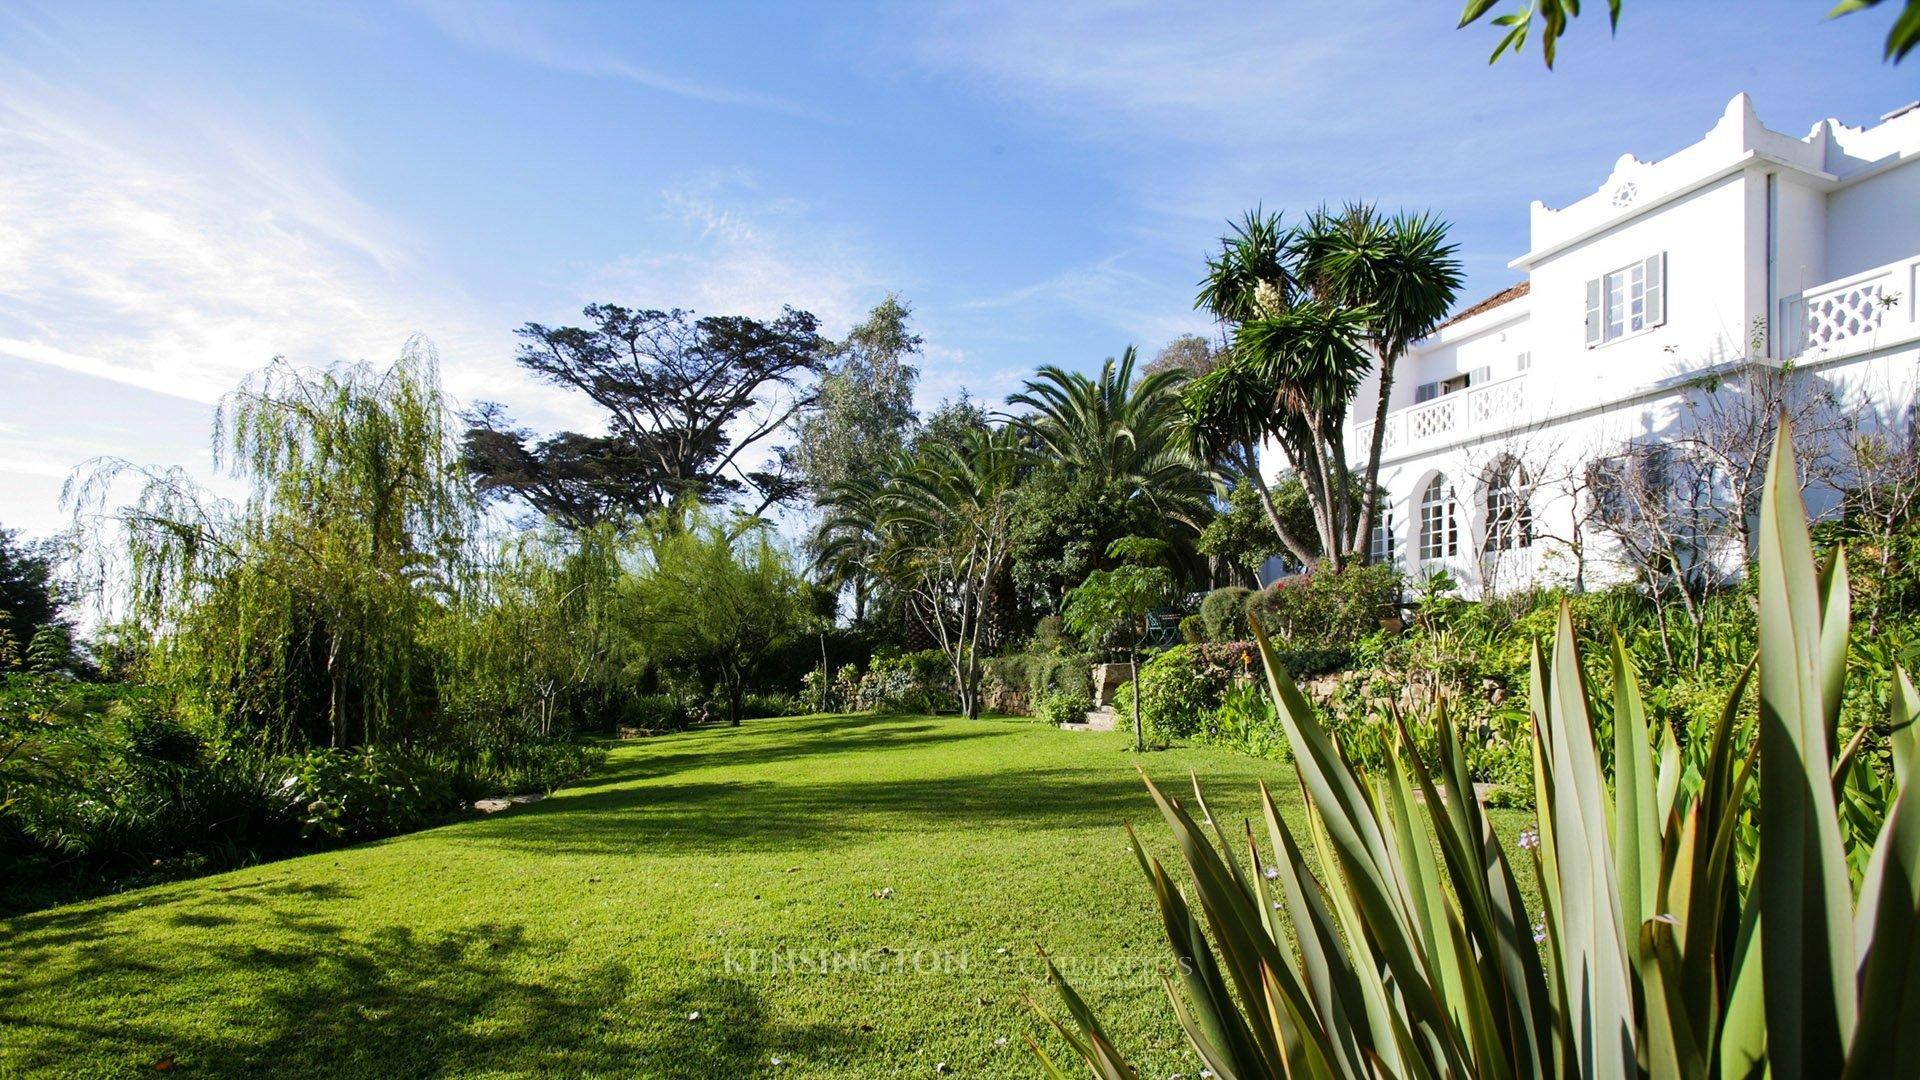 KPPM00794: Villa Suhail Villa de luxe Tanger Maroc